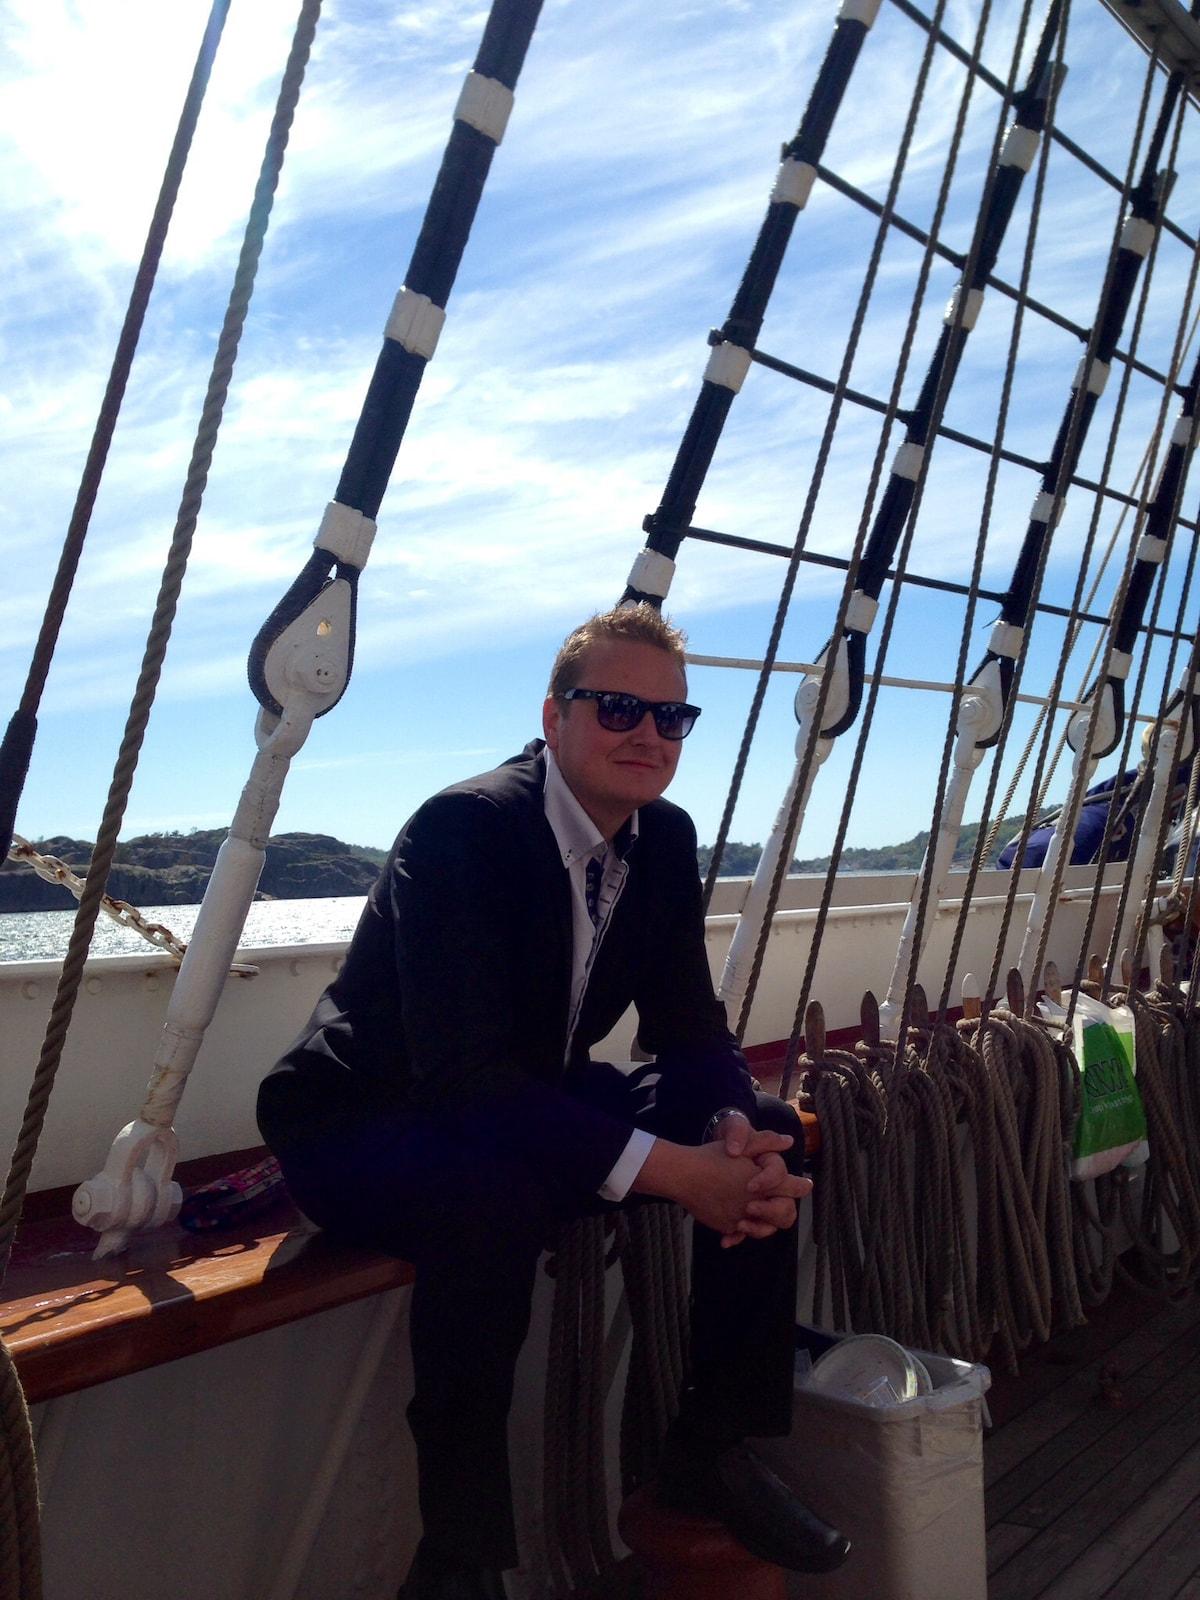 Gunnar from Stavanger